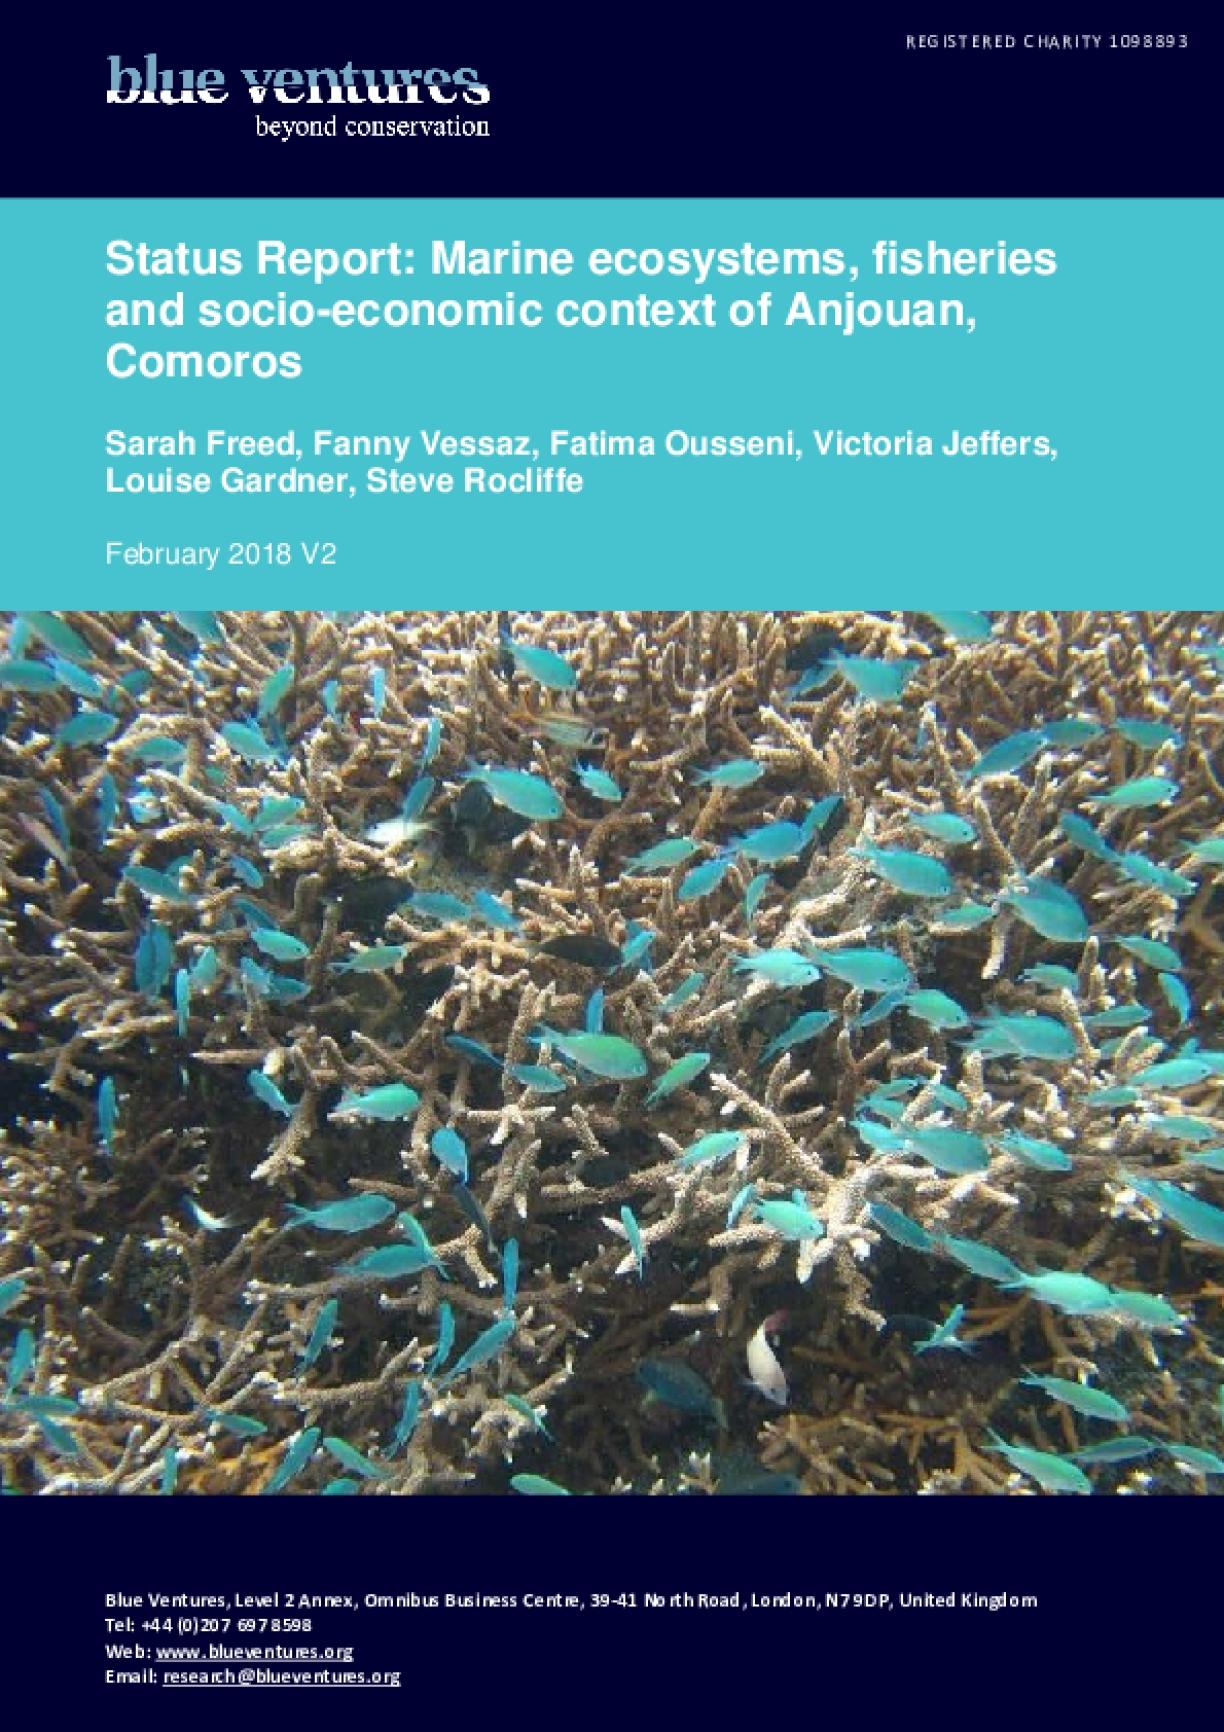 Status Report: Marine ecosystems, fisheries and socio-economic context of Anjouan, Comoros